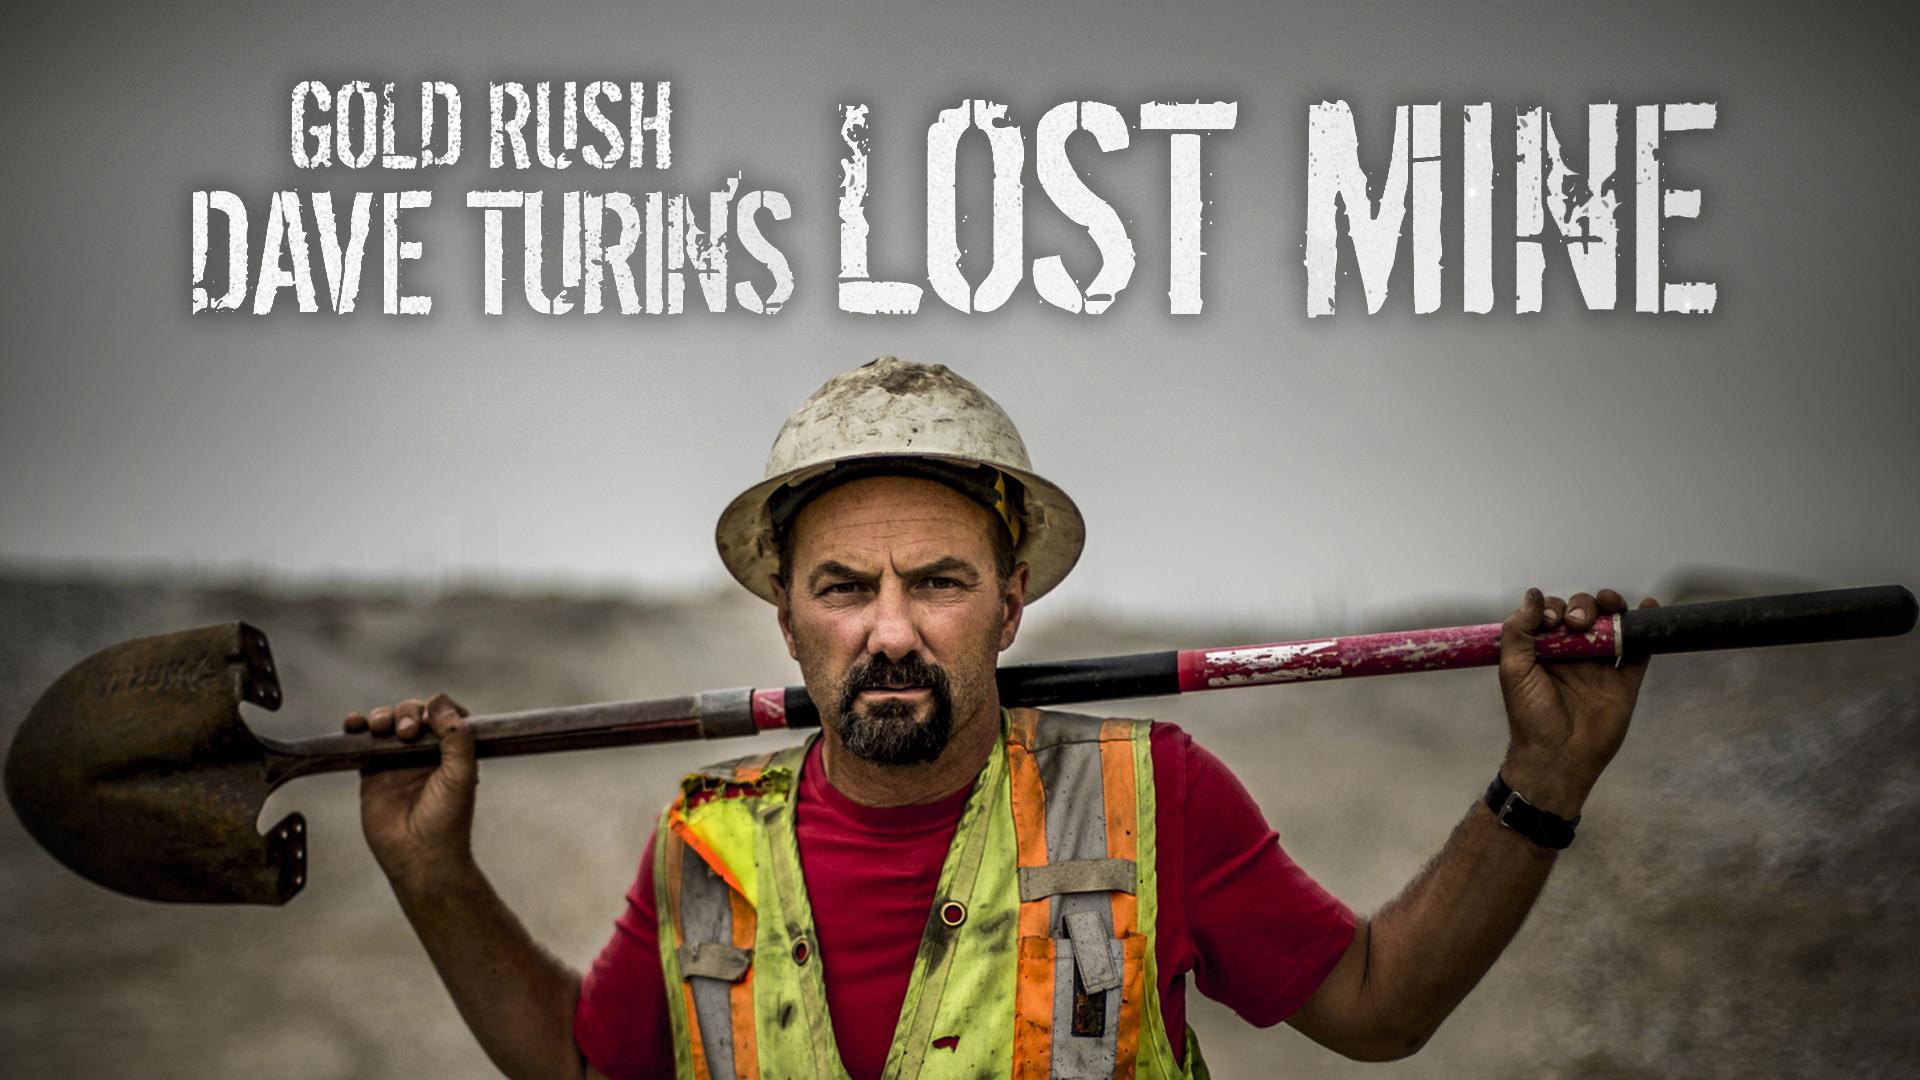 Gold Rush: Dave Turin's Lost Mine - Season 1